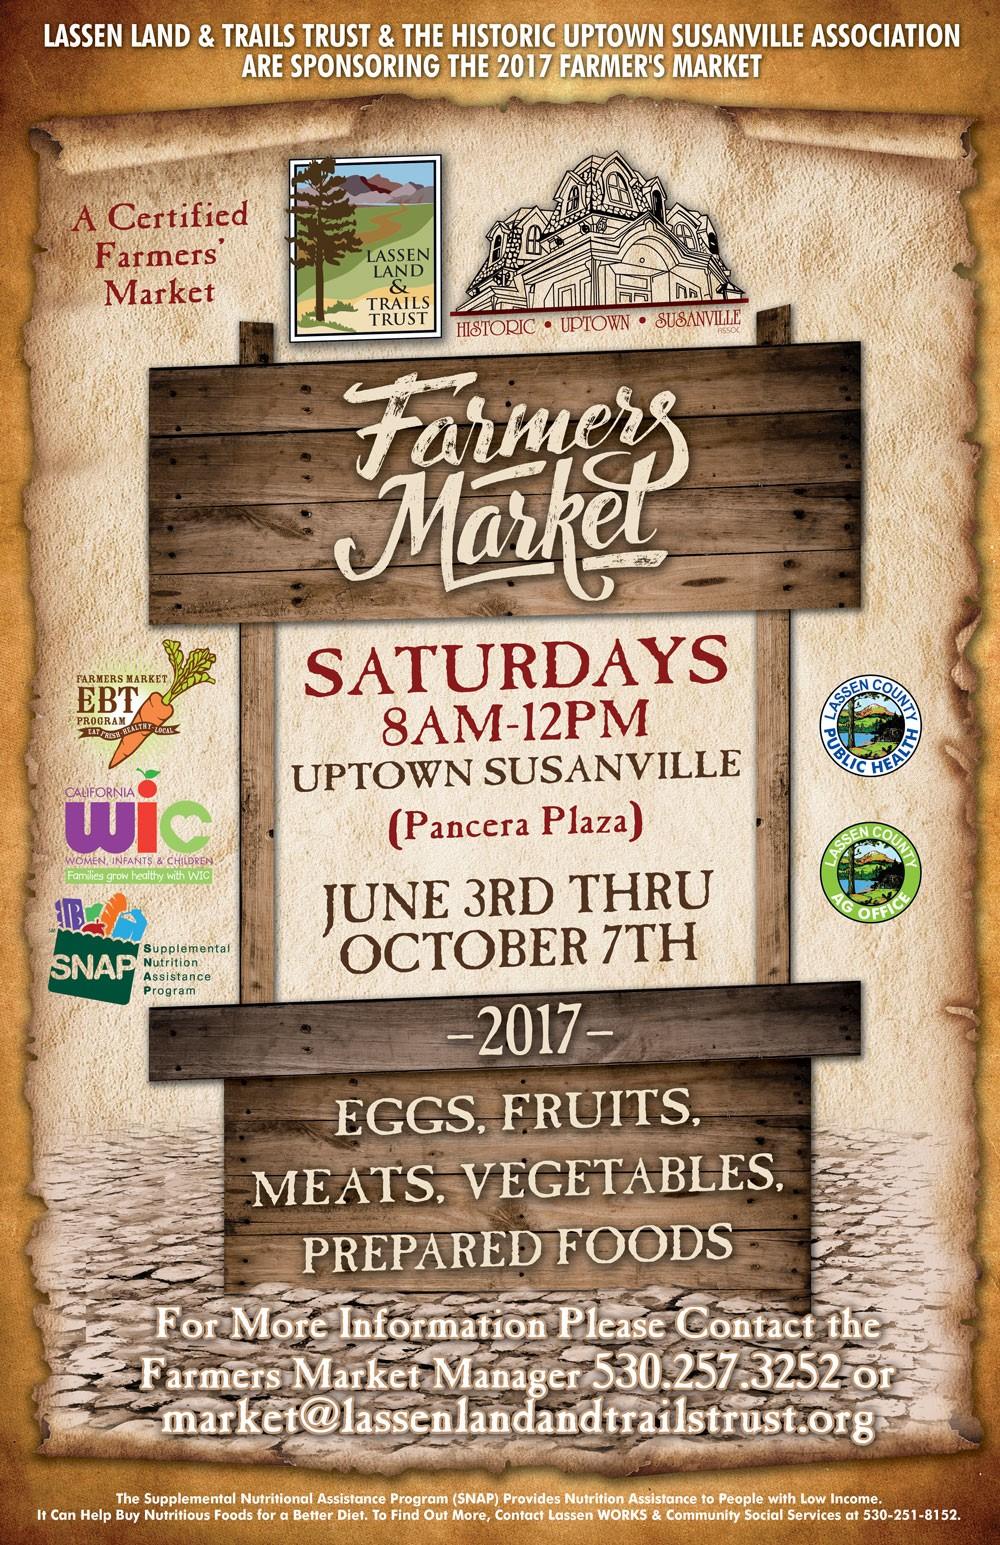 Farmers Market - Uptown Susanville(Pancera Plaza)8am - 12 pm